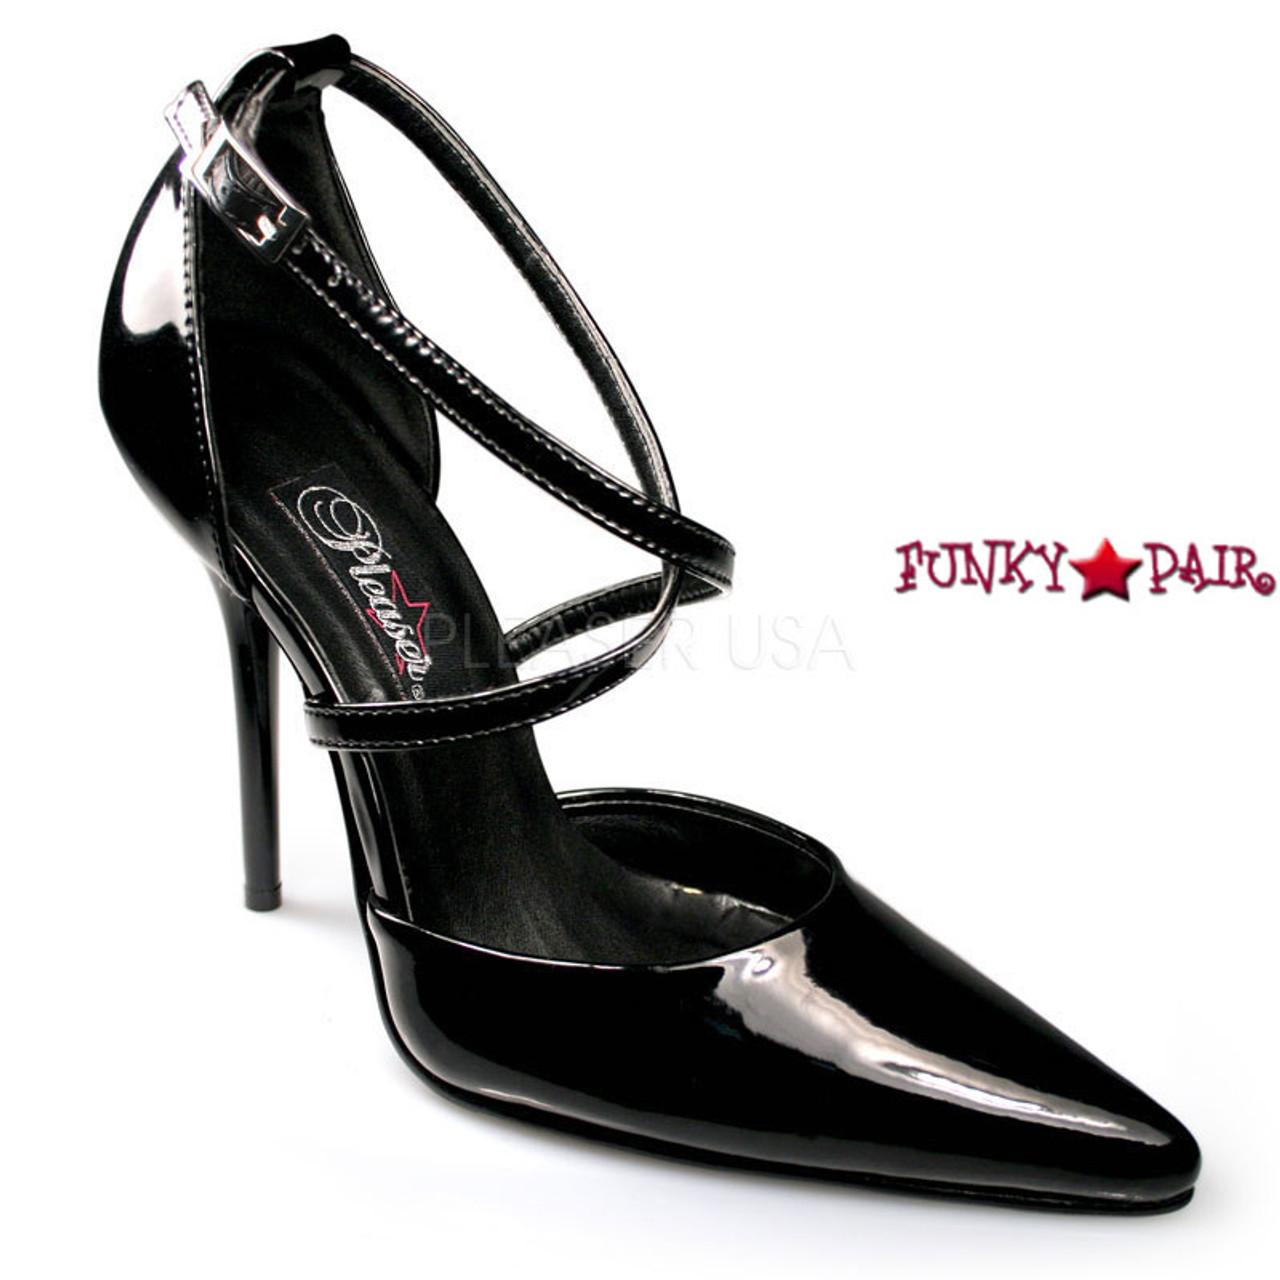 29d3560f3c Milan-42, Quarter Criss Cross D'Orsay Heels Made By PLEASER ...